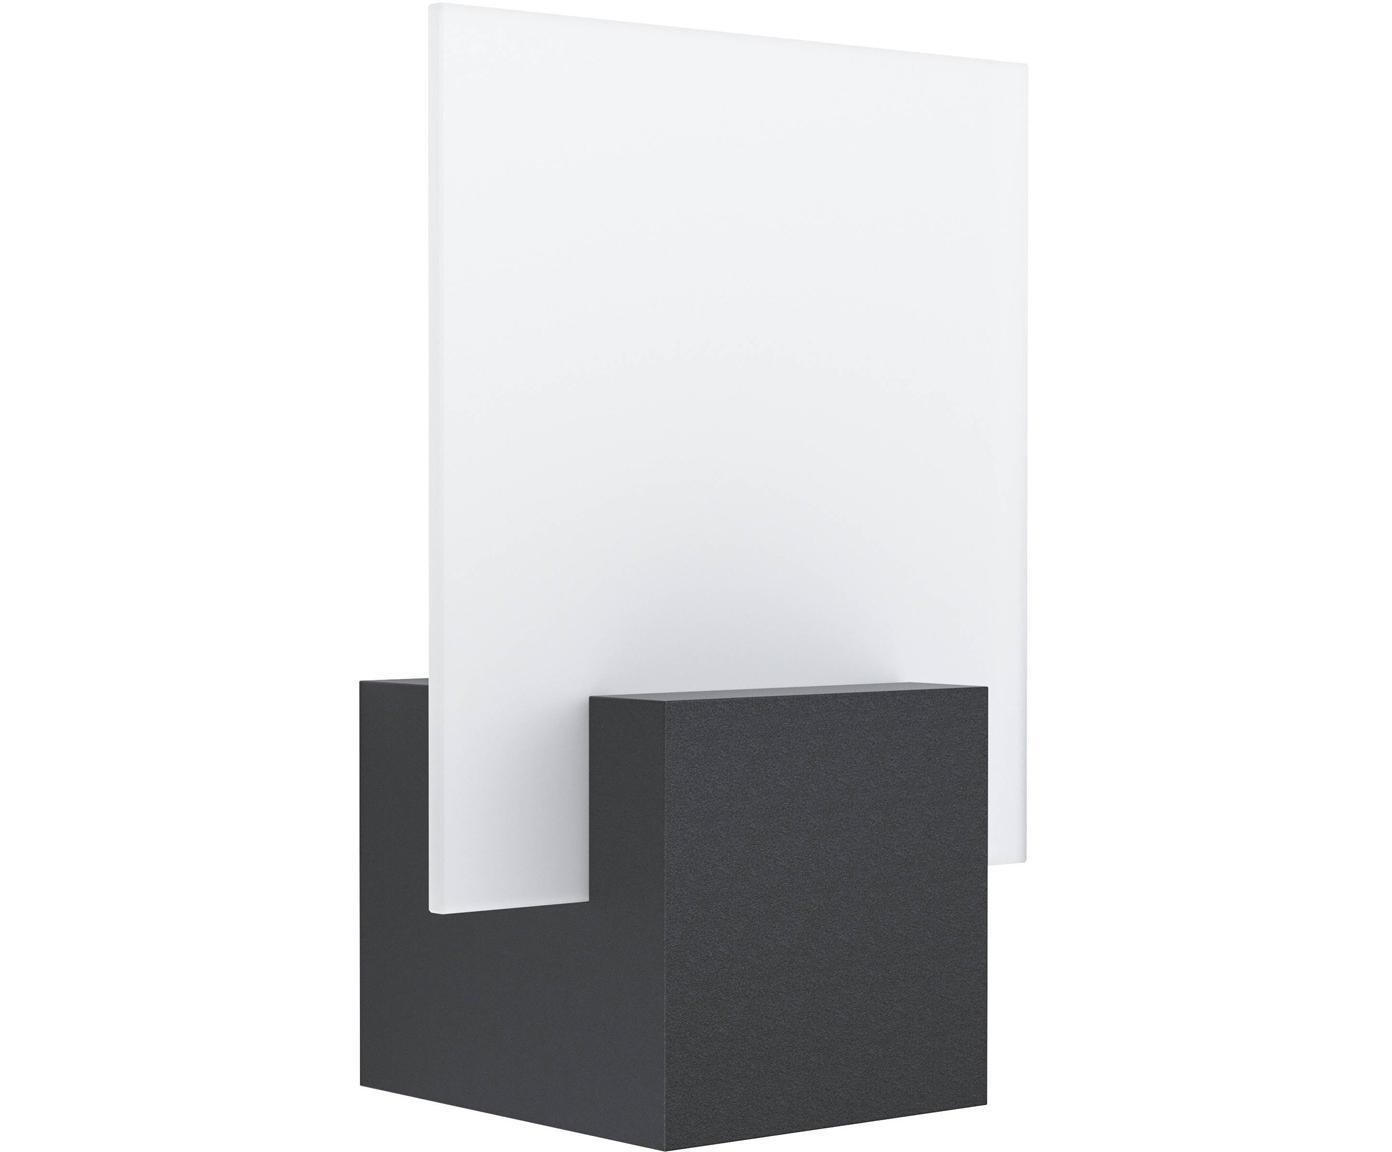 Outdoor LED wandlamp Adamello, Aluminium, gesatineerd glas, Zwart, wit, 20 x 28 cm